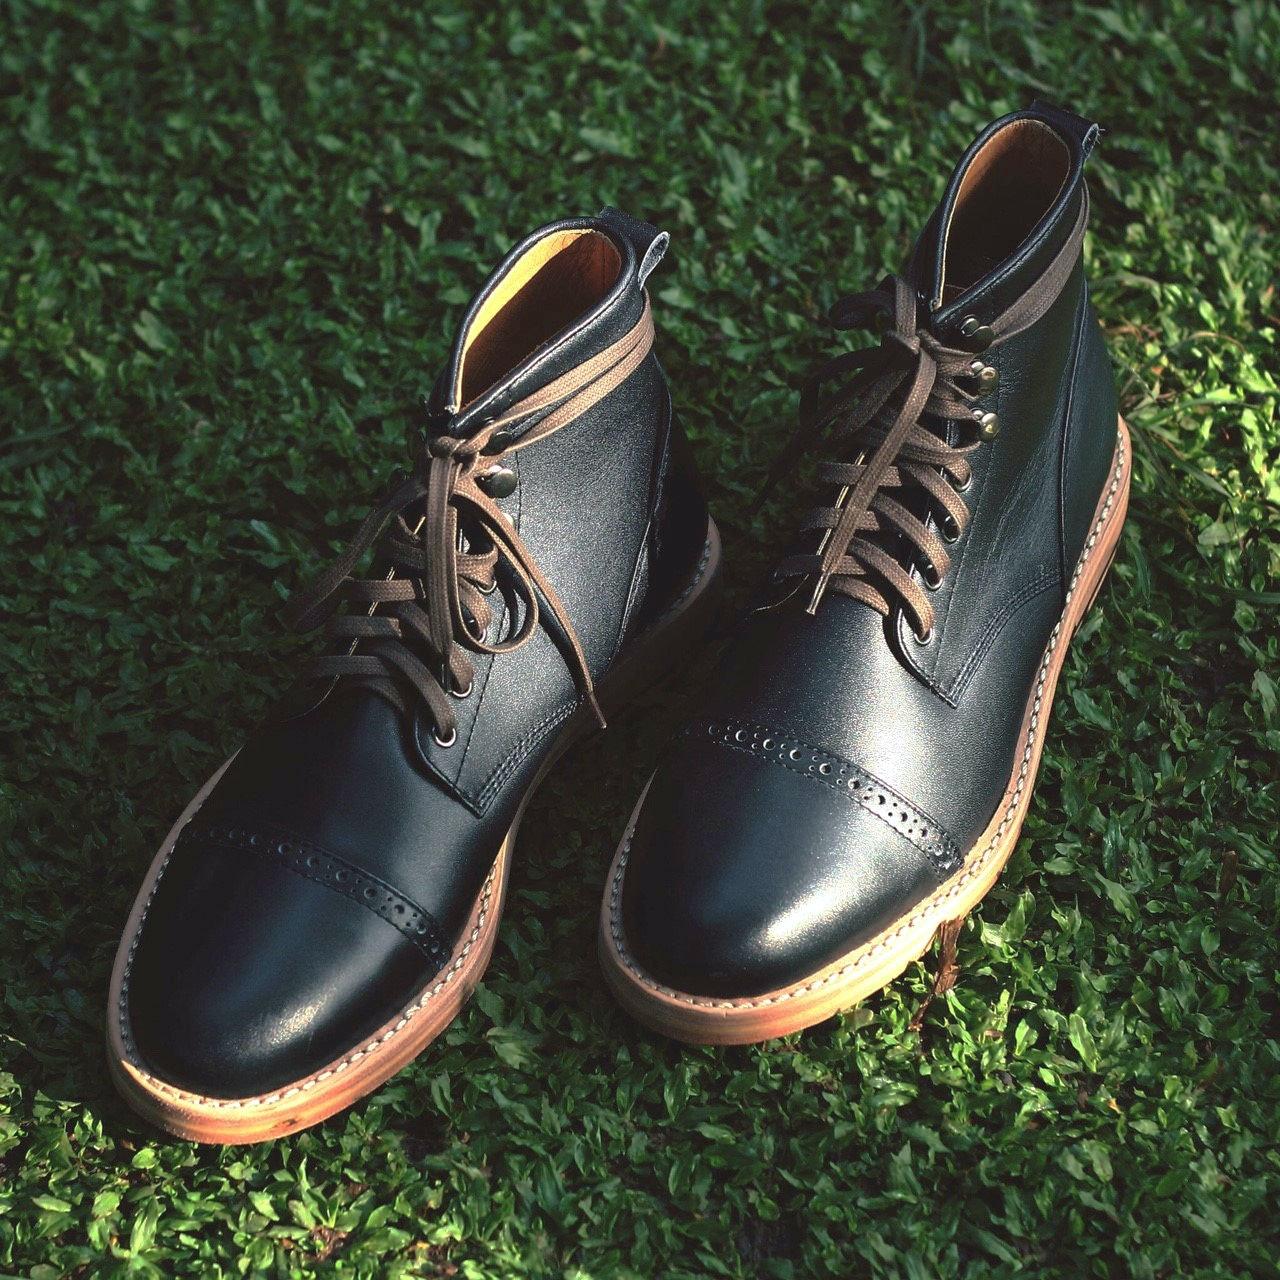 Chevalier Captoe Black Boot